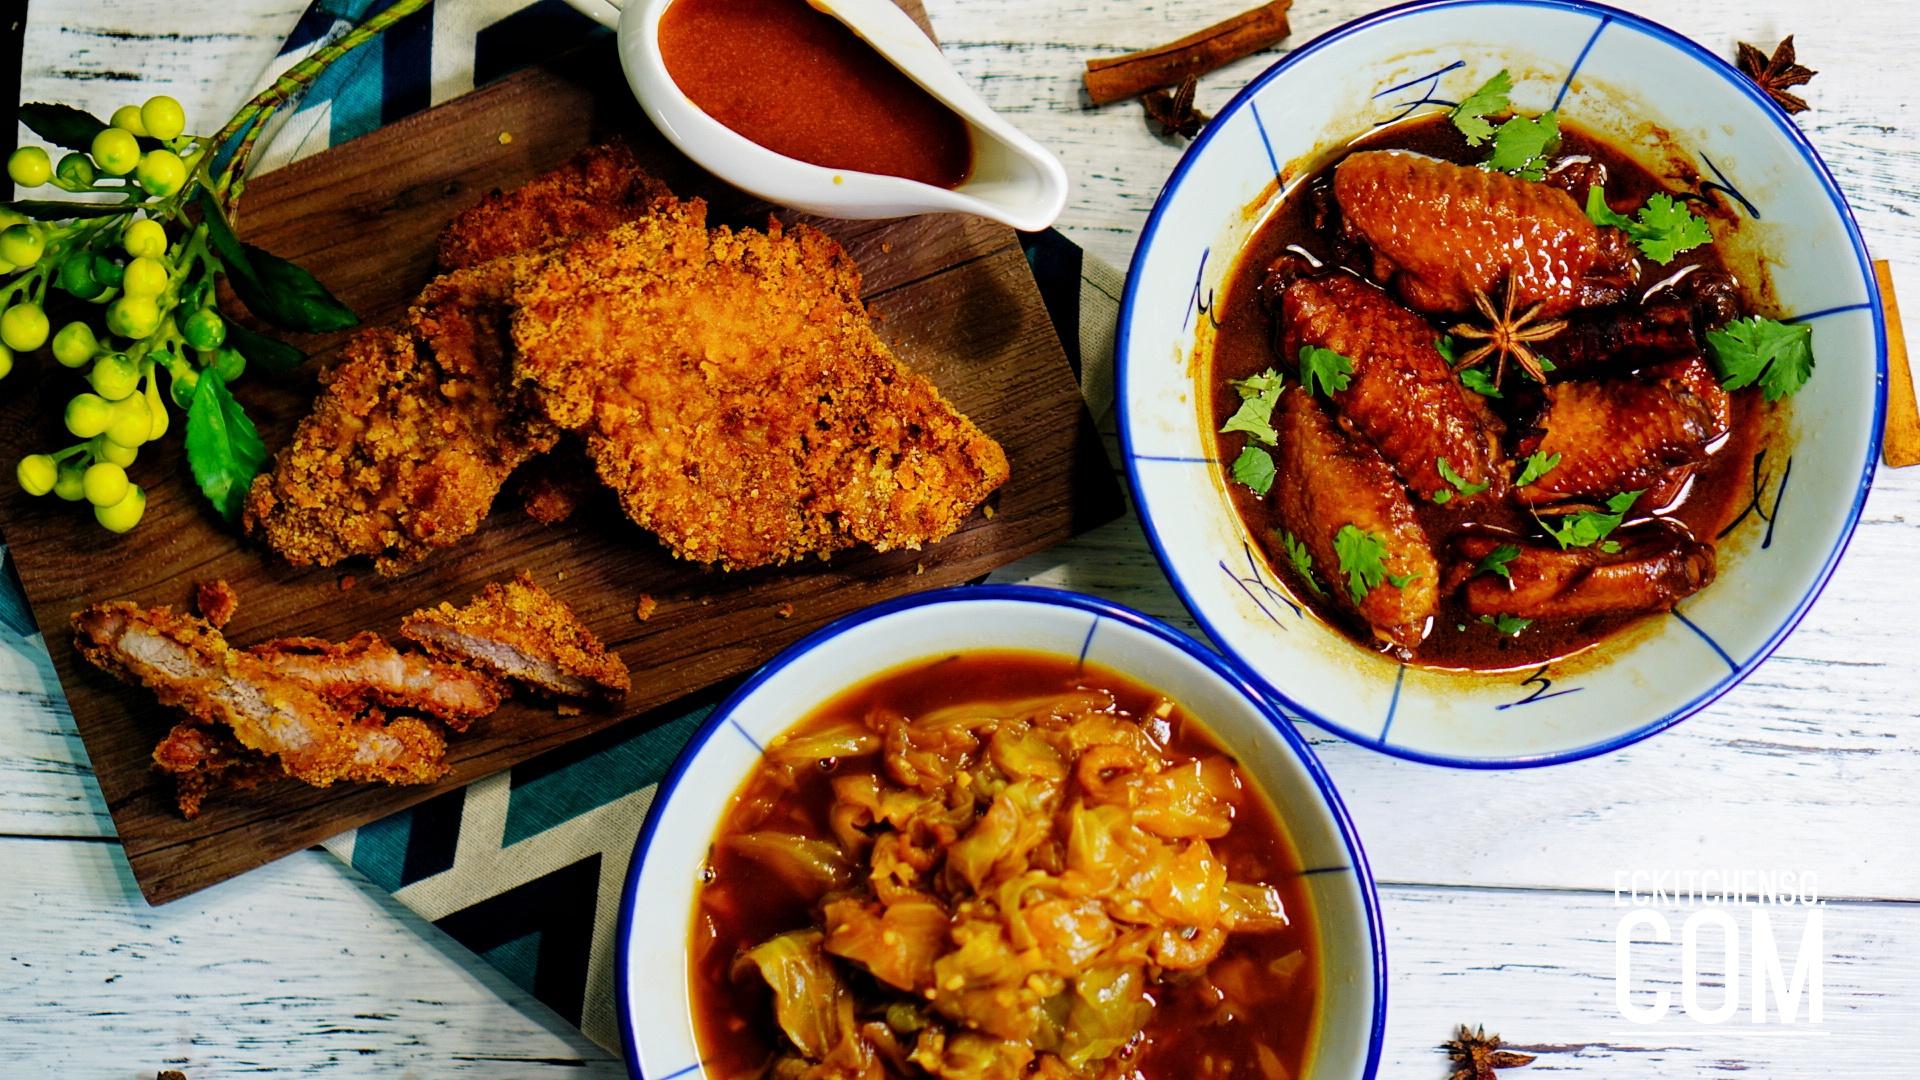 Hainanese Curry Rice with Scissors Cut Hainanese Pork Chop